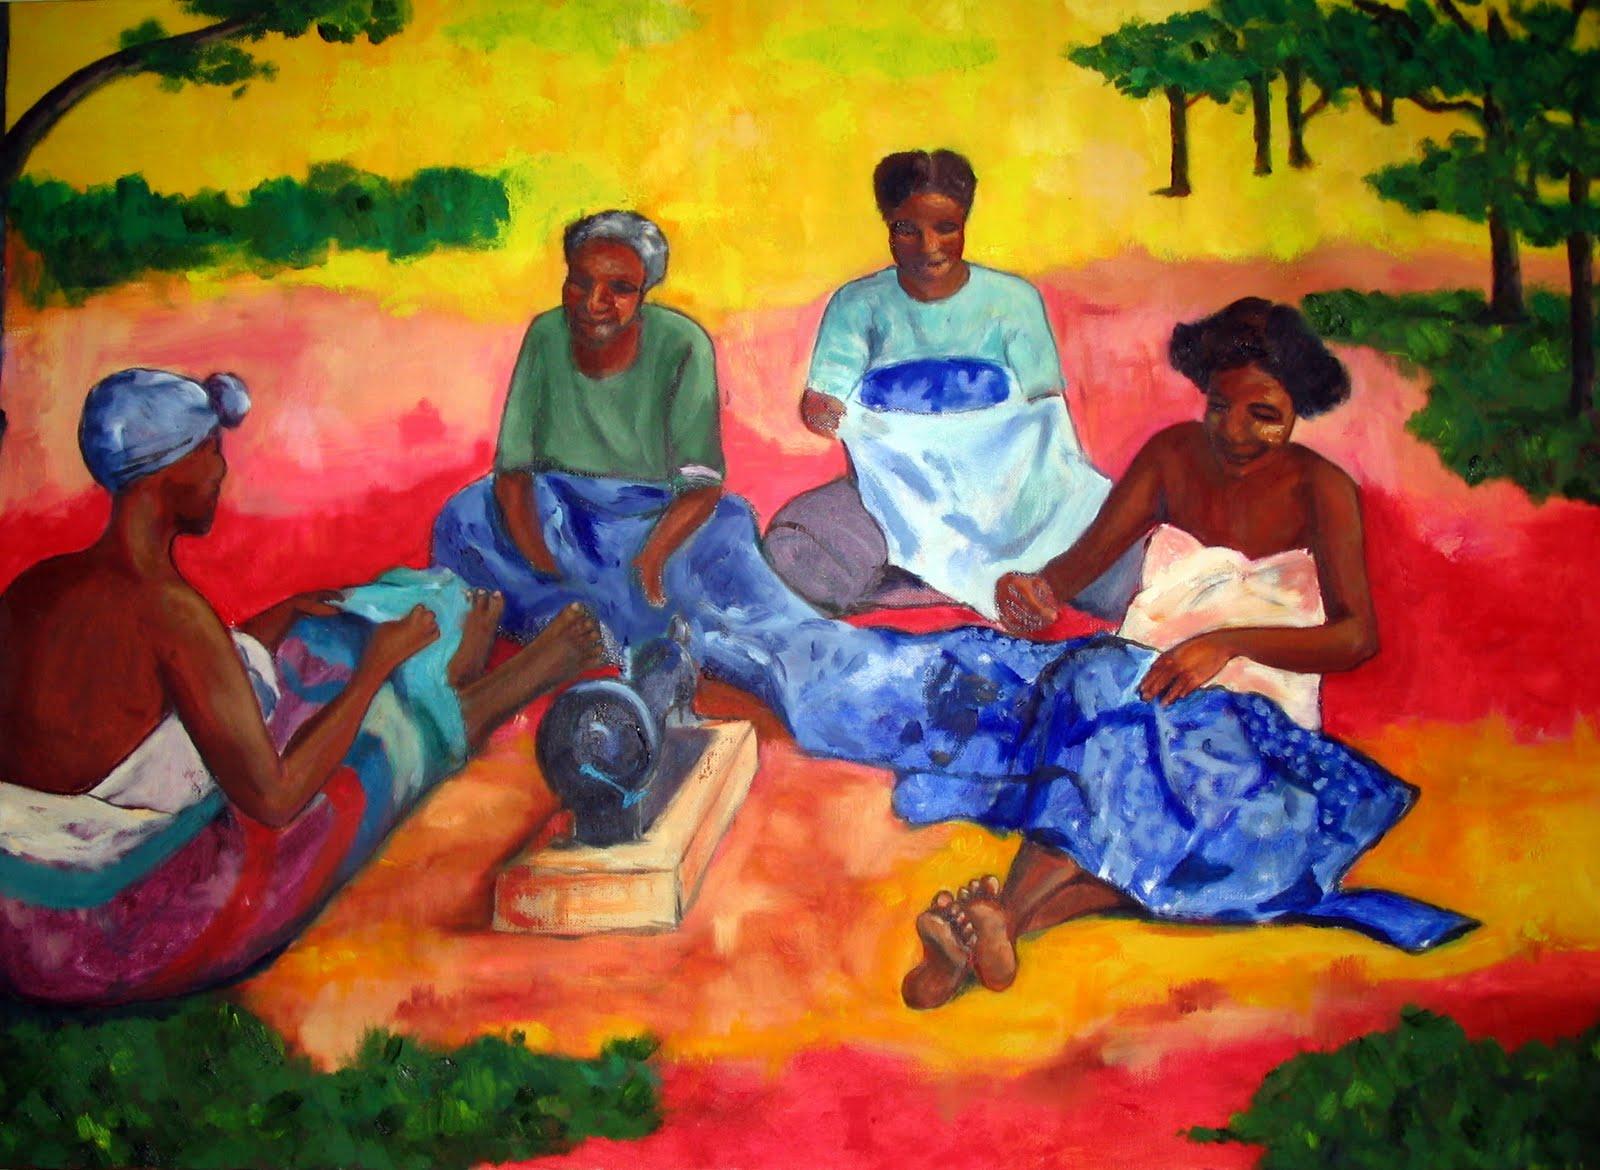 Paintings: Madagascar - SusanLisbin.com